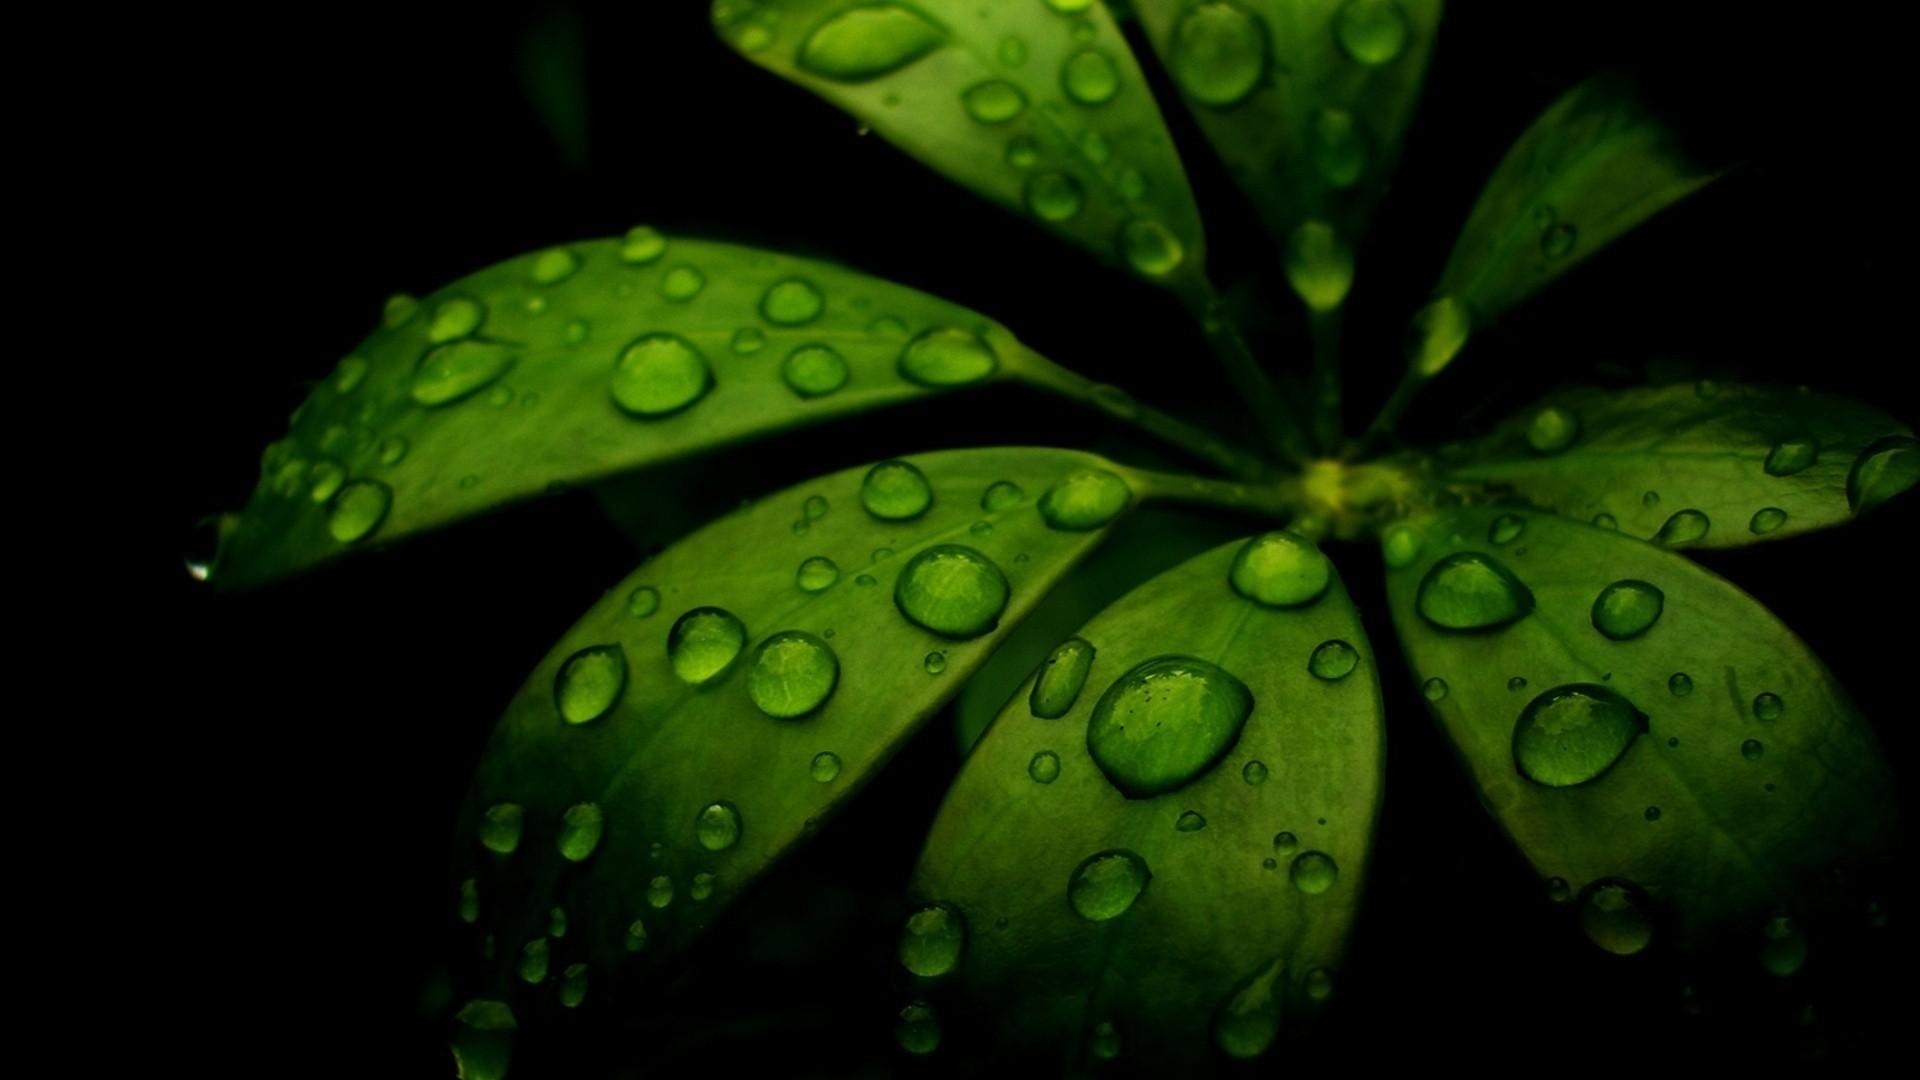 leaf, green, black